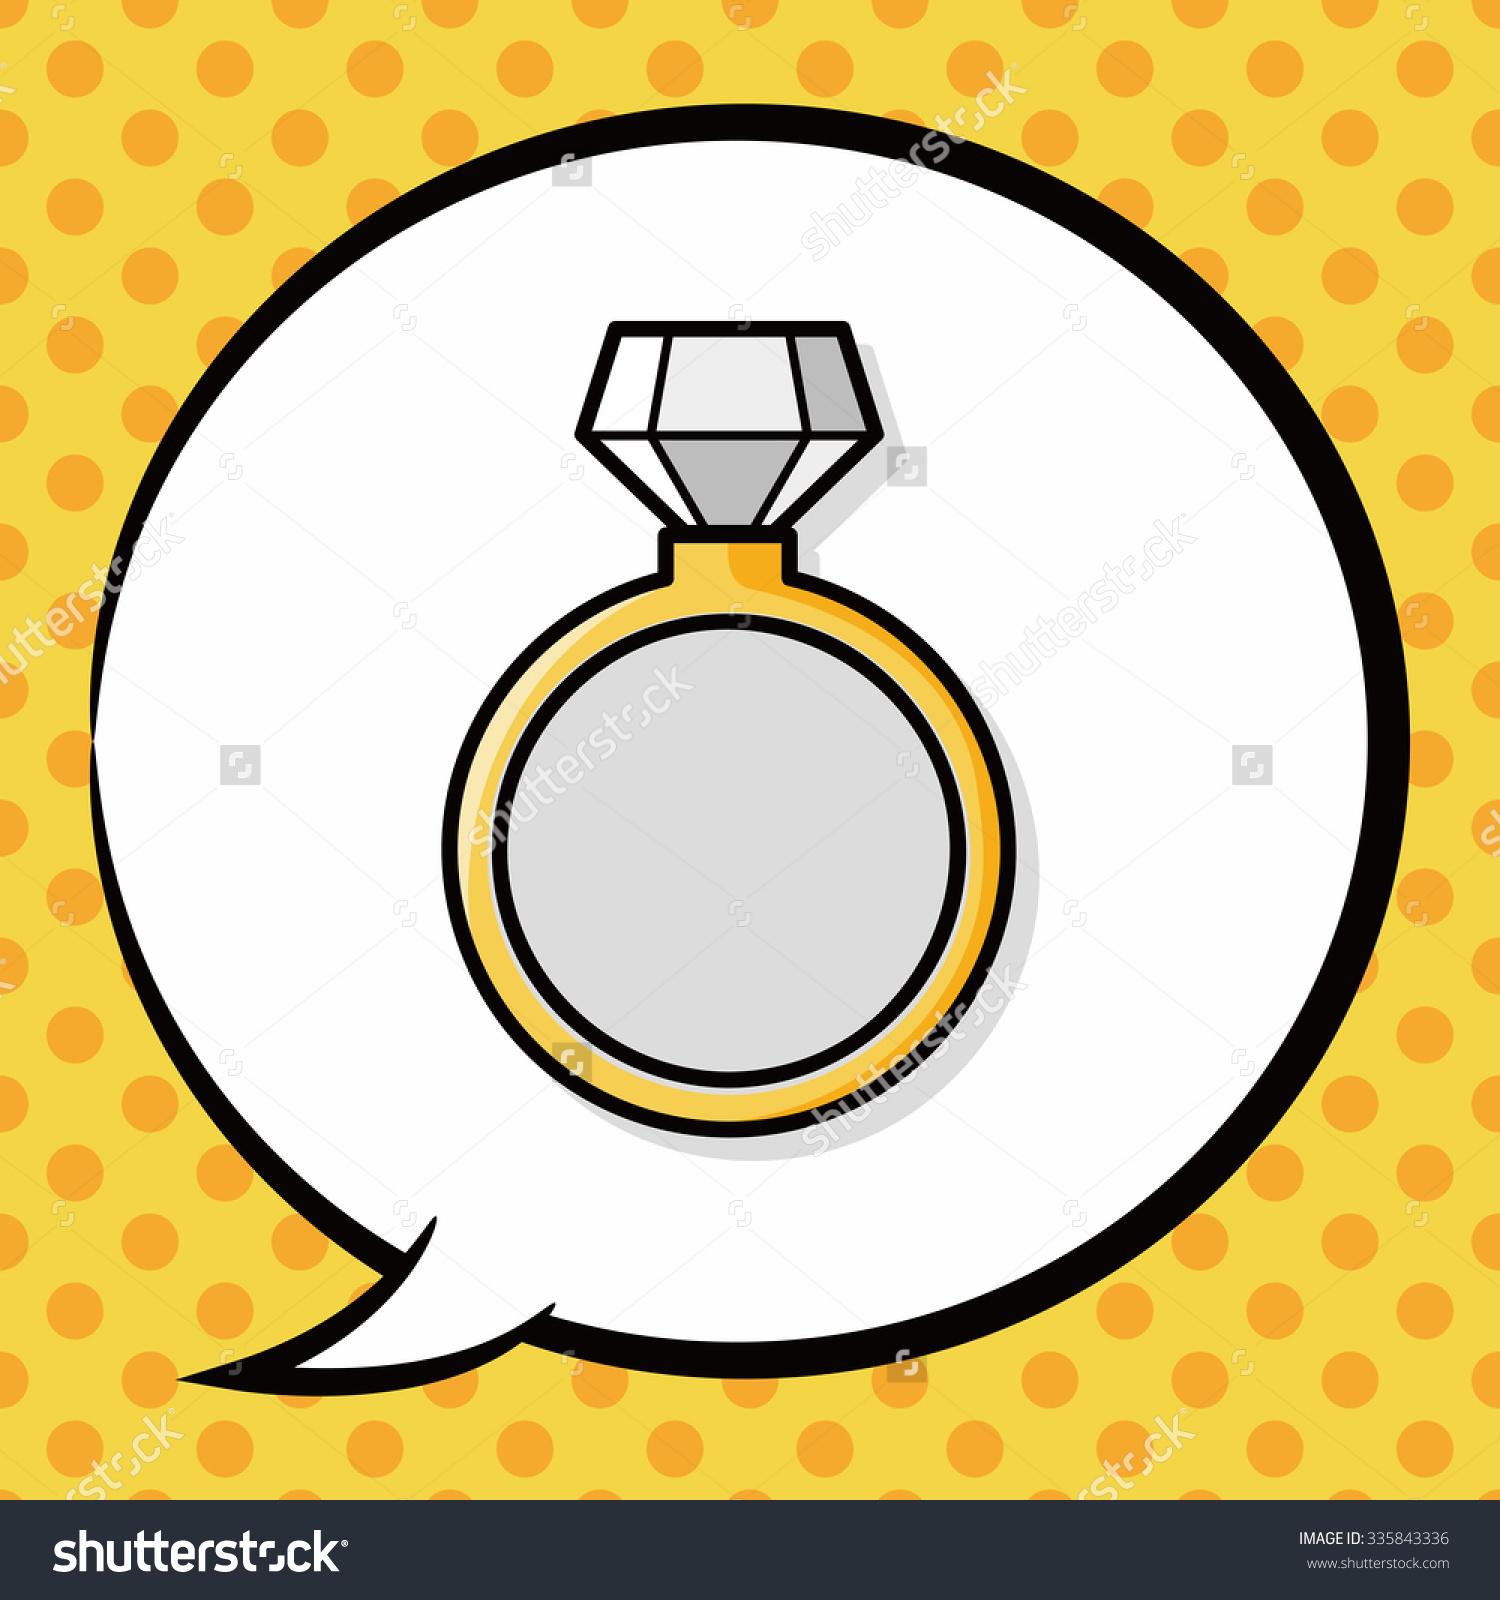 Diamond Ring Doodle, Speech Bubble Stock Vector Illustration.